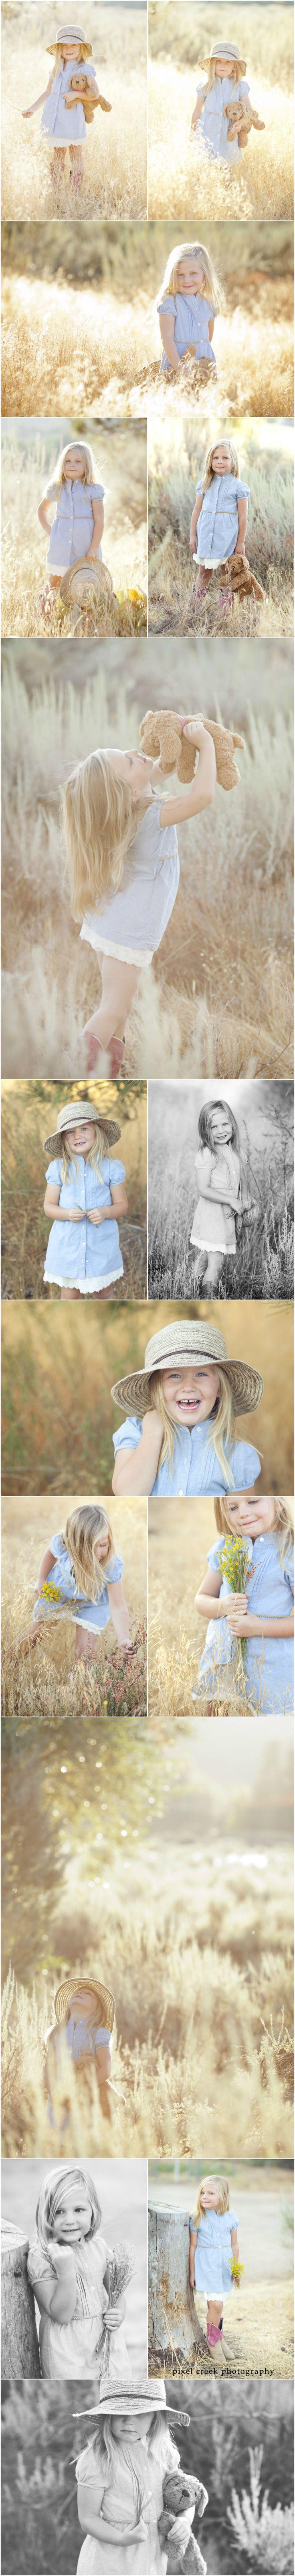 Our Free Spirit | San Diego Family Photographer - San Diego Photography | San Diego Photographer | Pixel Creek Photograhy | Karen Cox San Diego County Photographer Specializing in Family, Children, Couples, and High School Seniors